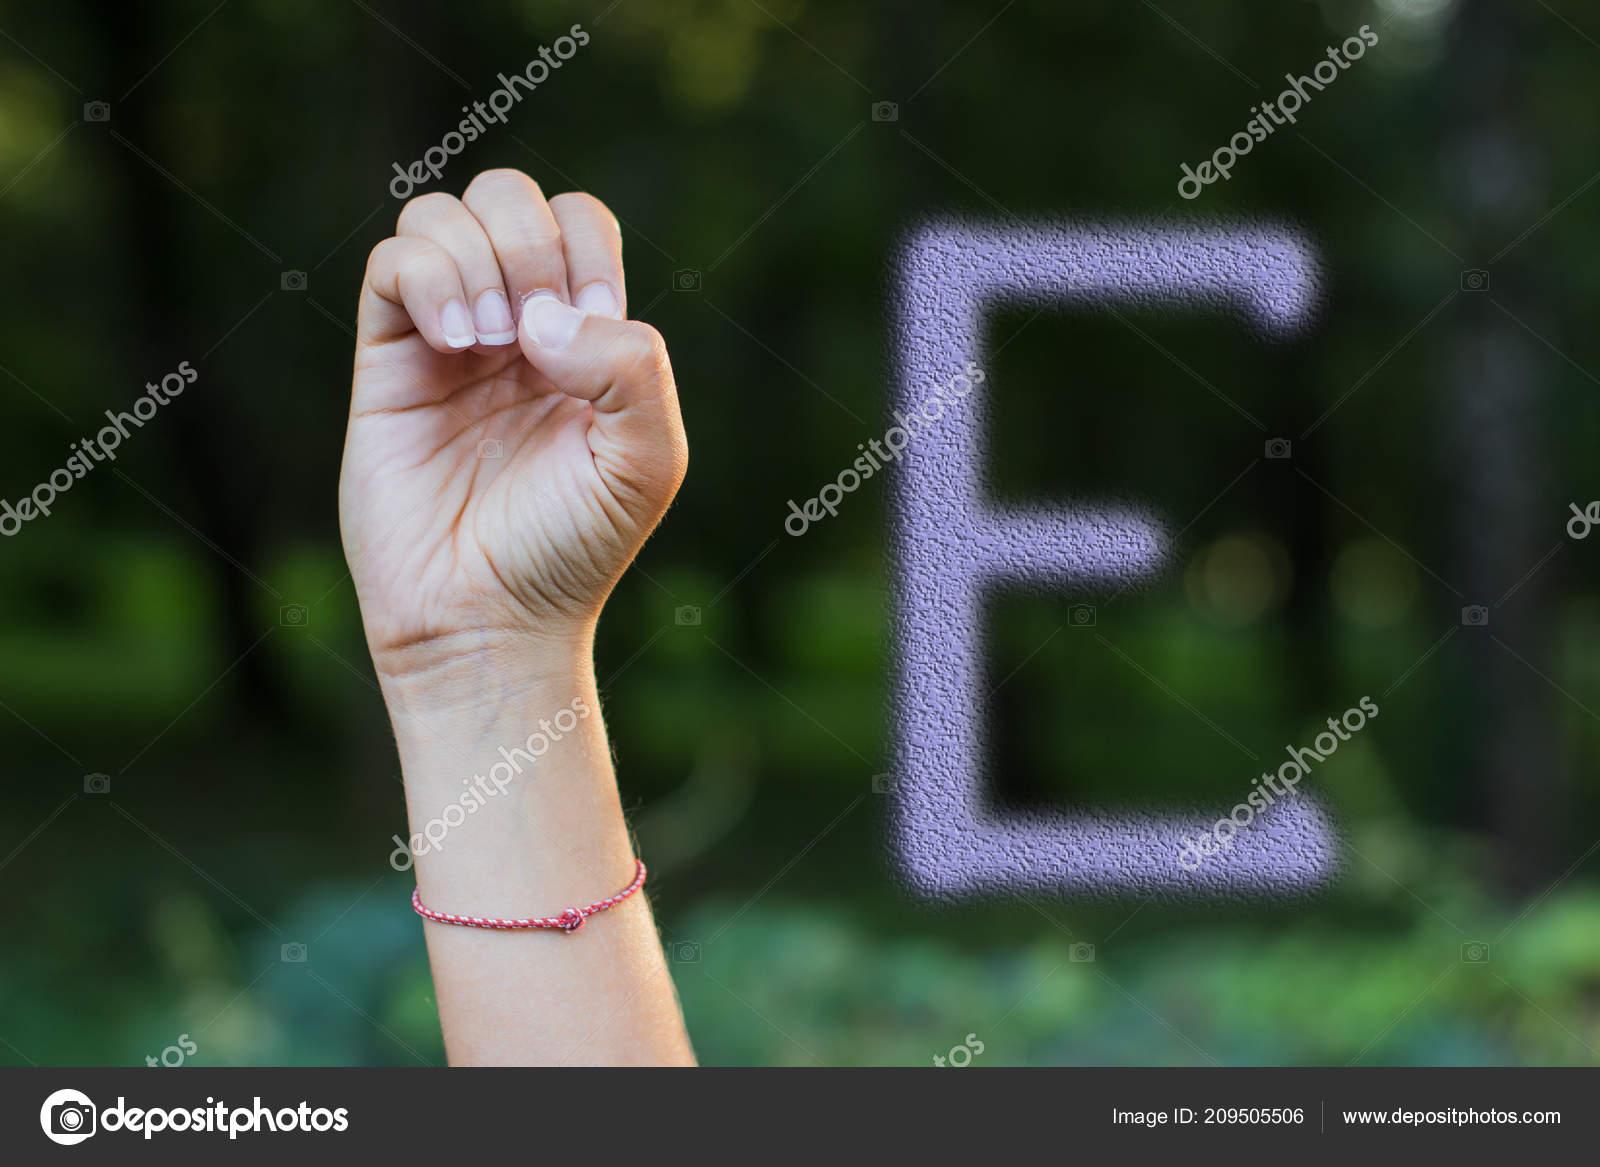 Non Verbal People Communication Concept Dactyl Alphabet